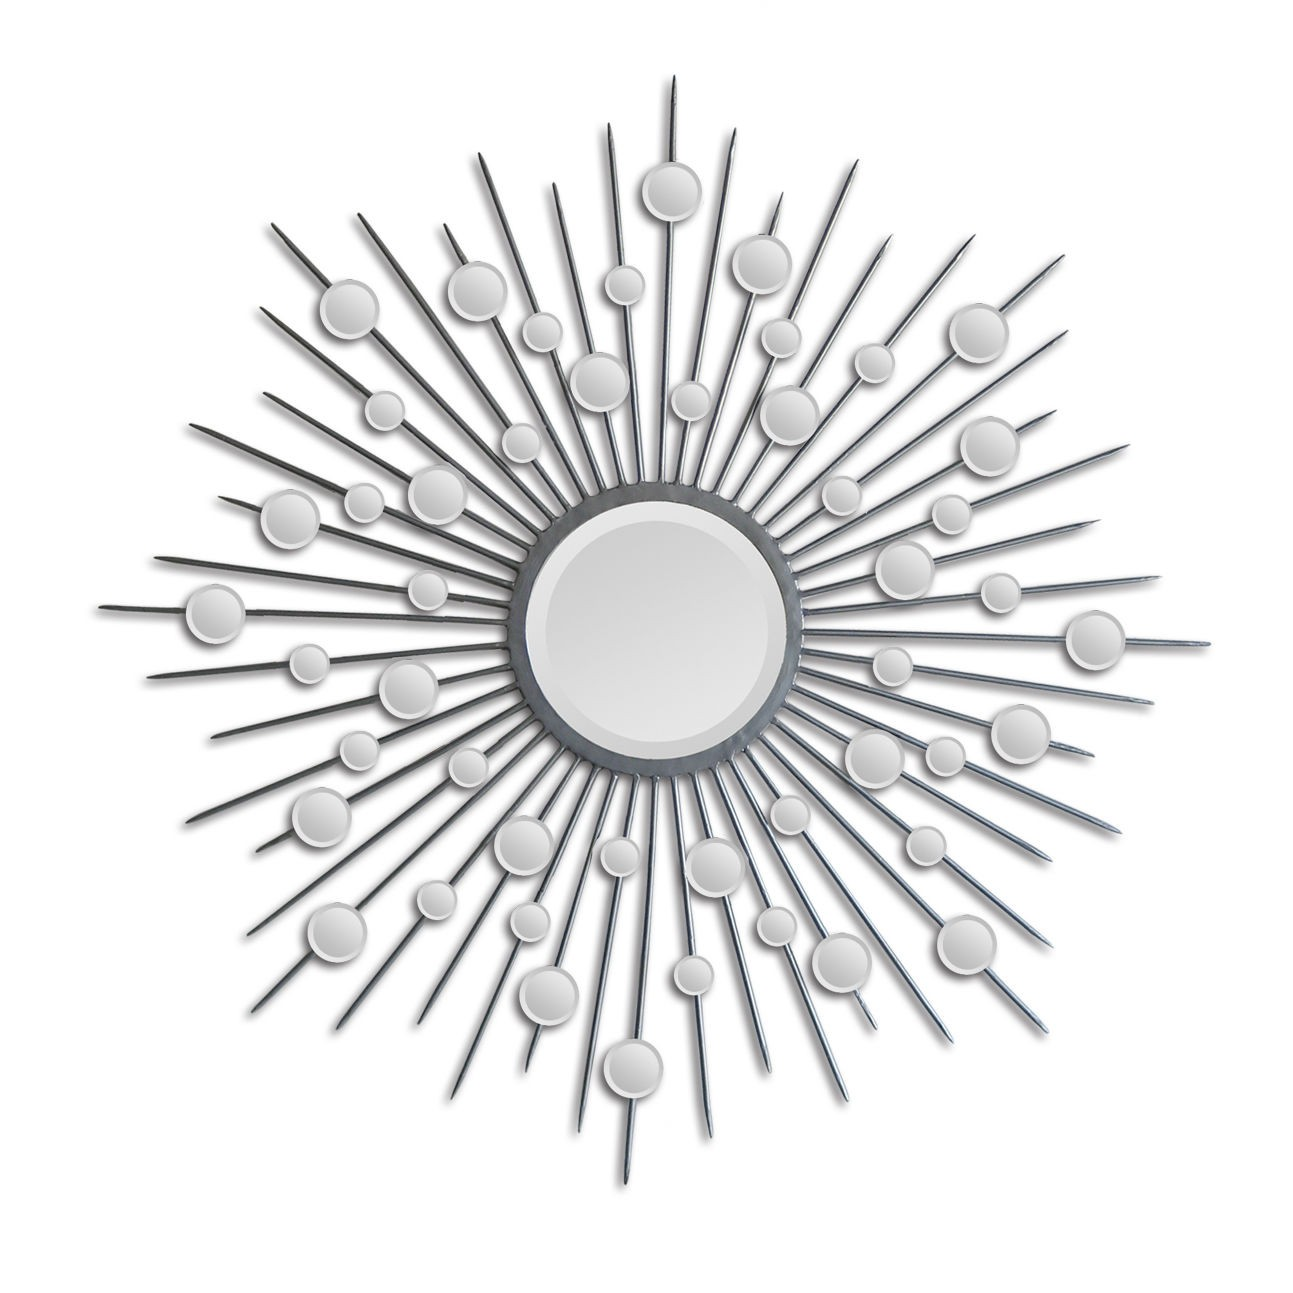 1293x1293 Interior Home Goods Sunburst Mirror Sunburst Wall Decor